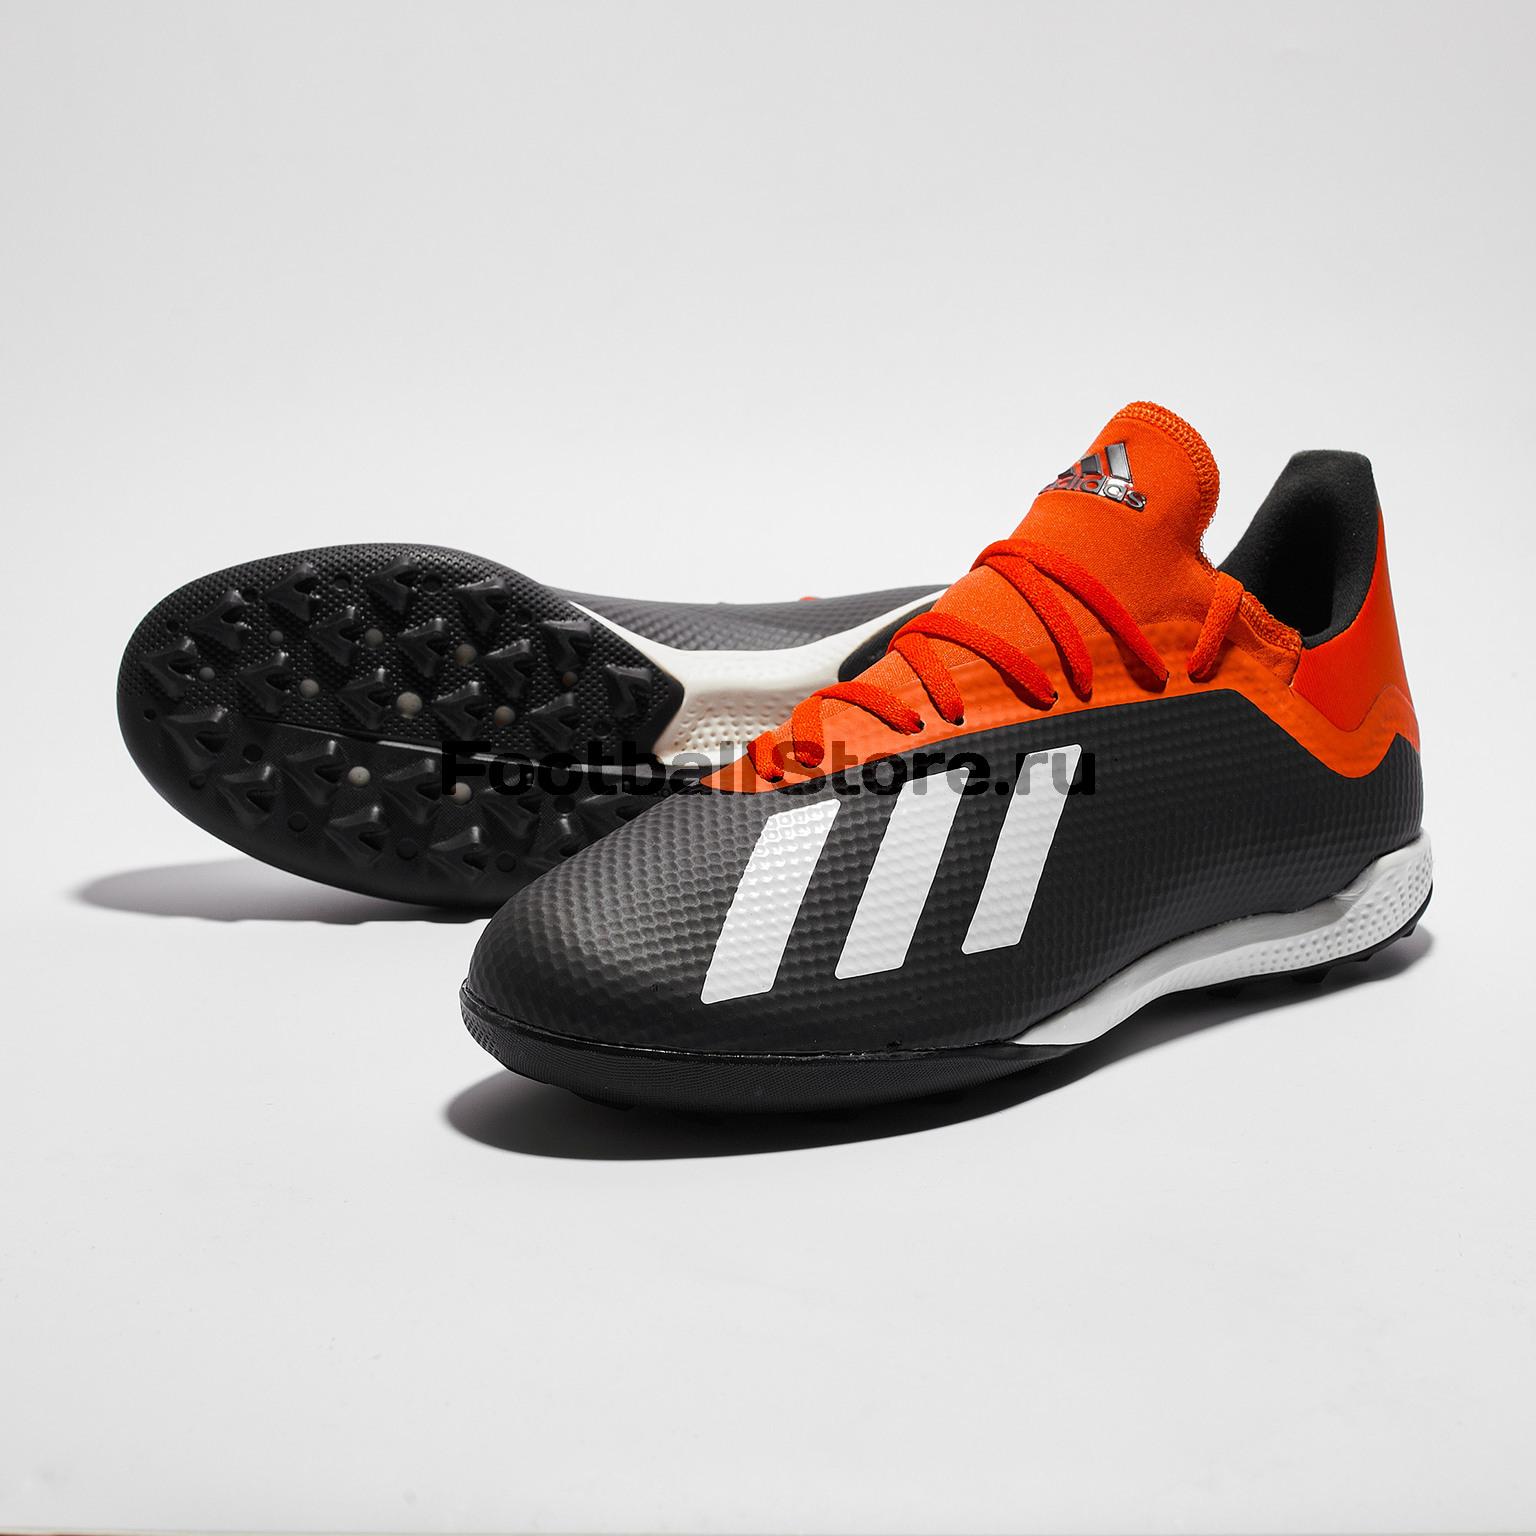 Шиповки Adidas X 18.3 TF BB9398 парфюмерия адидас